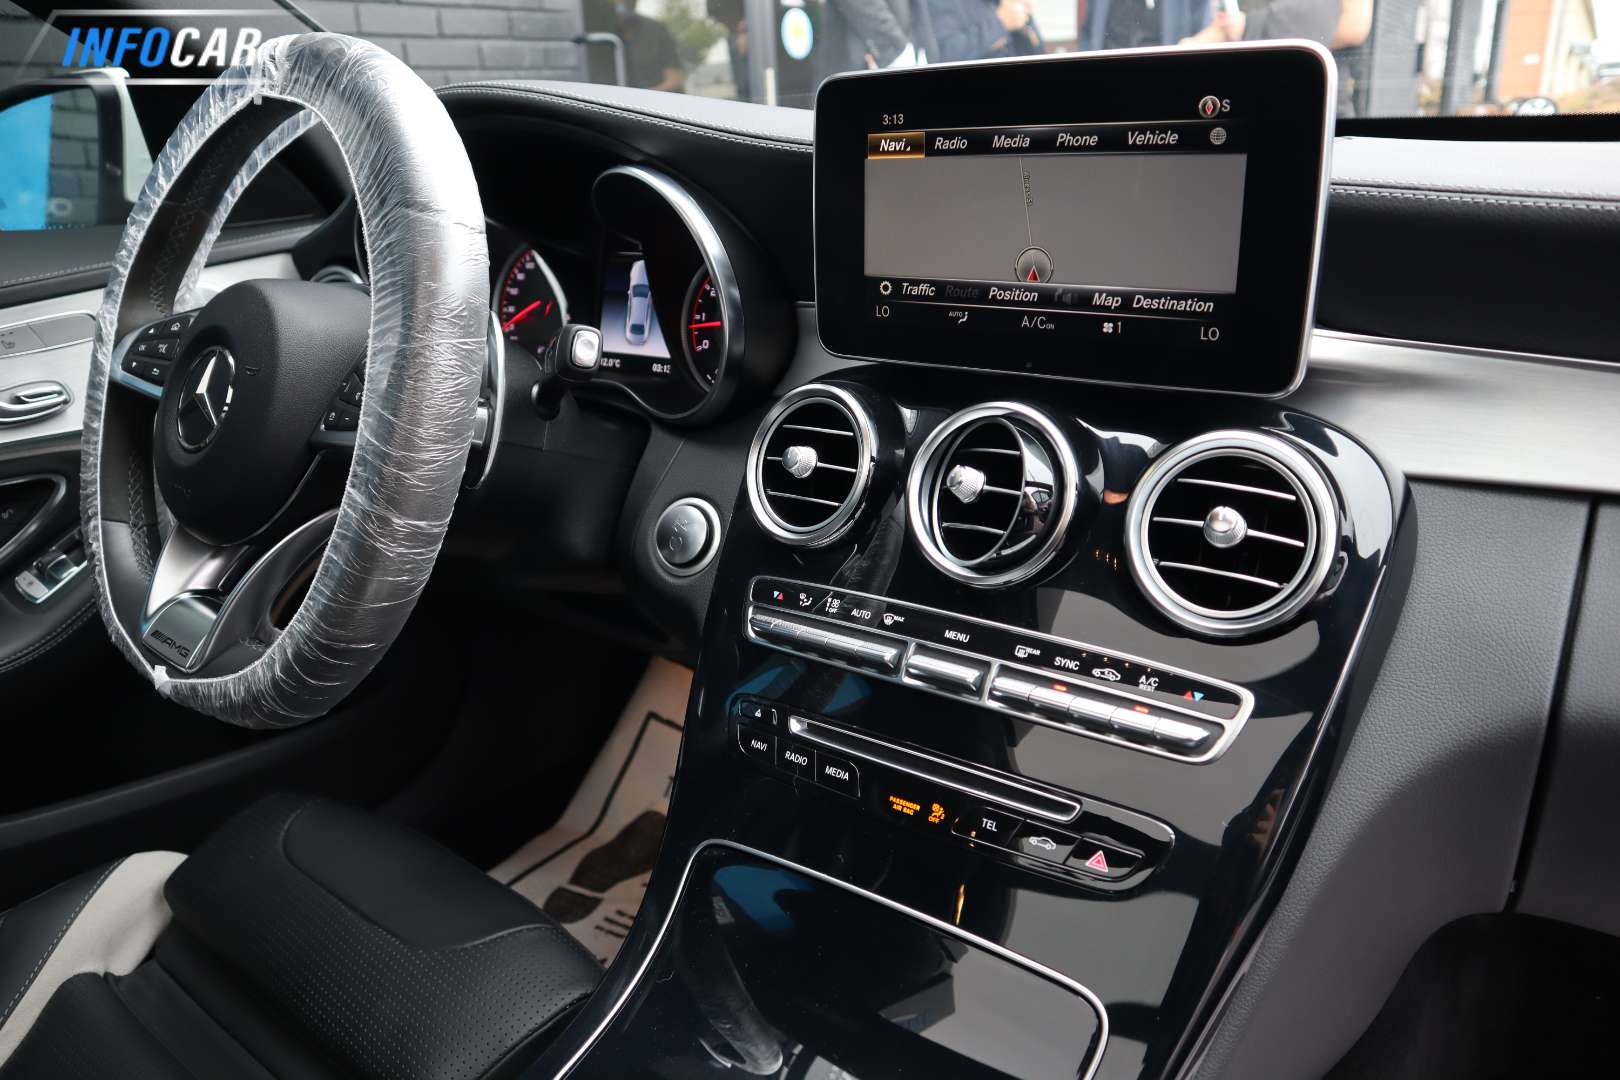 2018 Mercedes-Benz C-Class c63s sedan - INFOCAR - Toronto's Most Comprehensive New and Used Auto Trading Platform